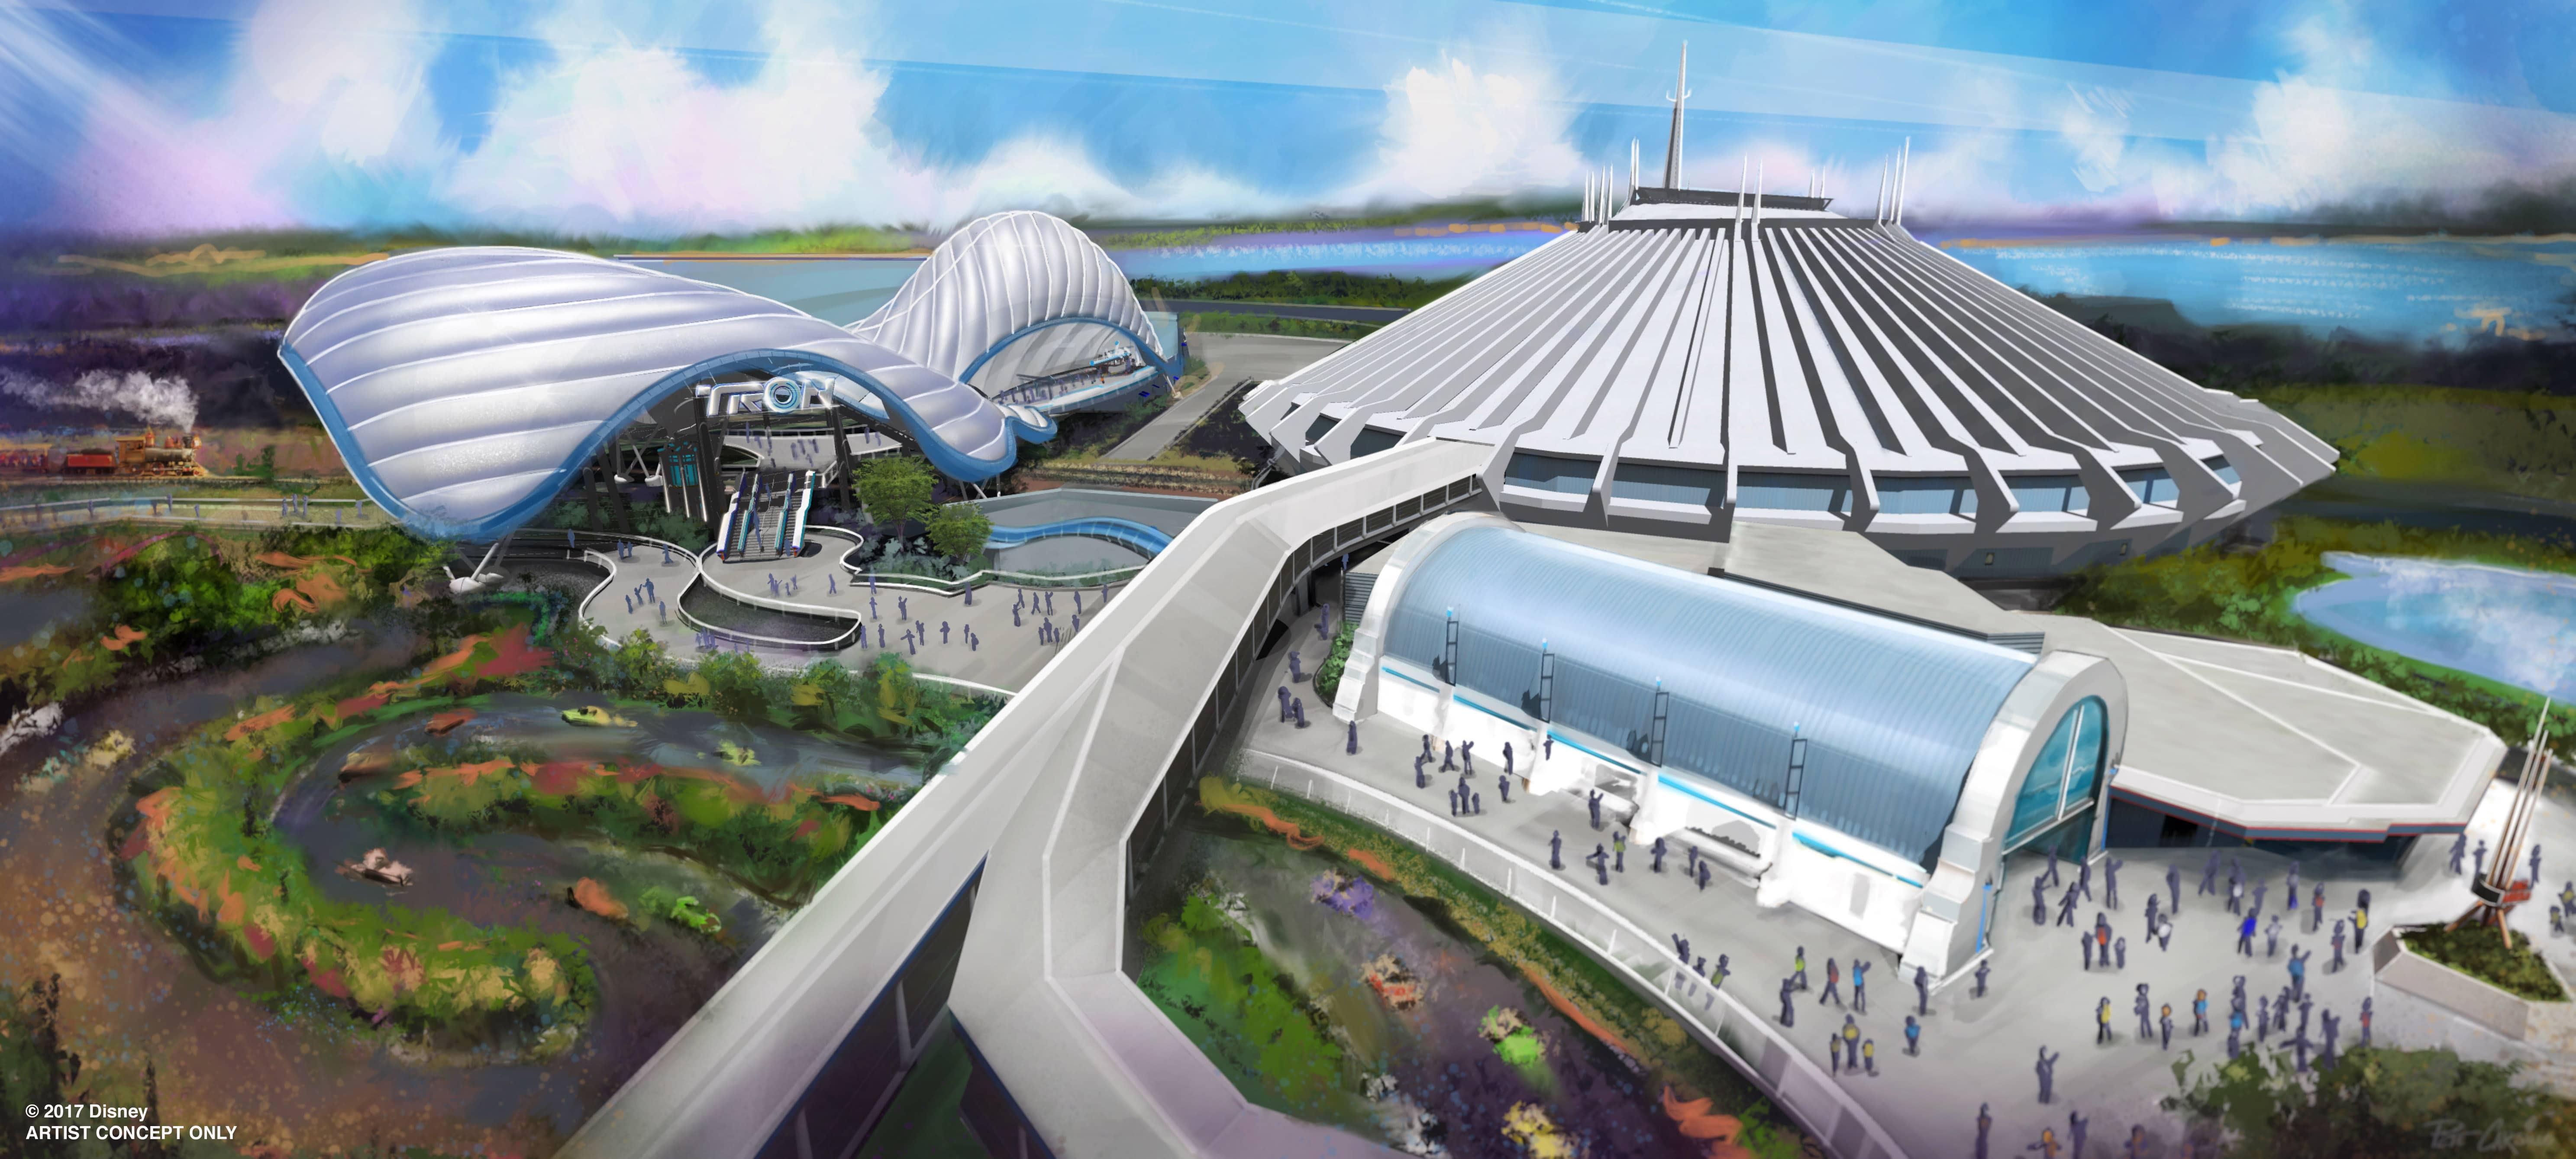 D23 Expo Magic Kingdom TRON